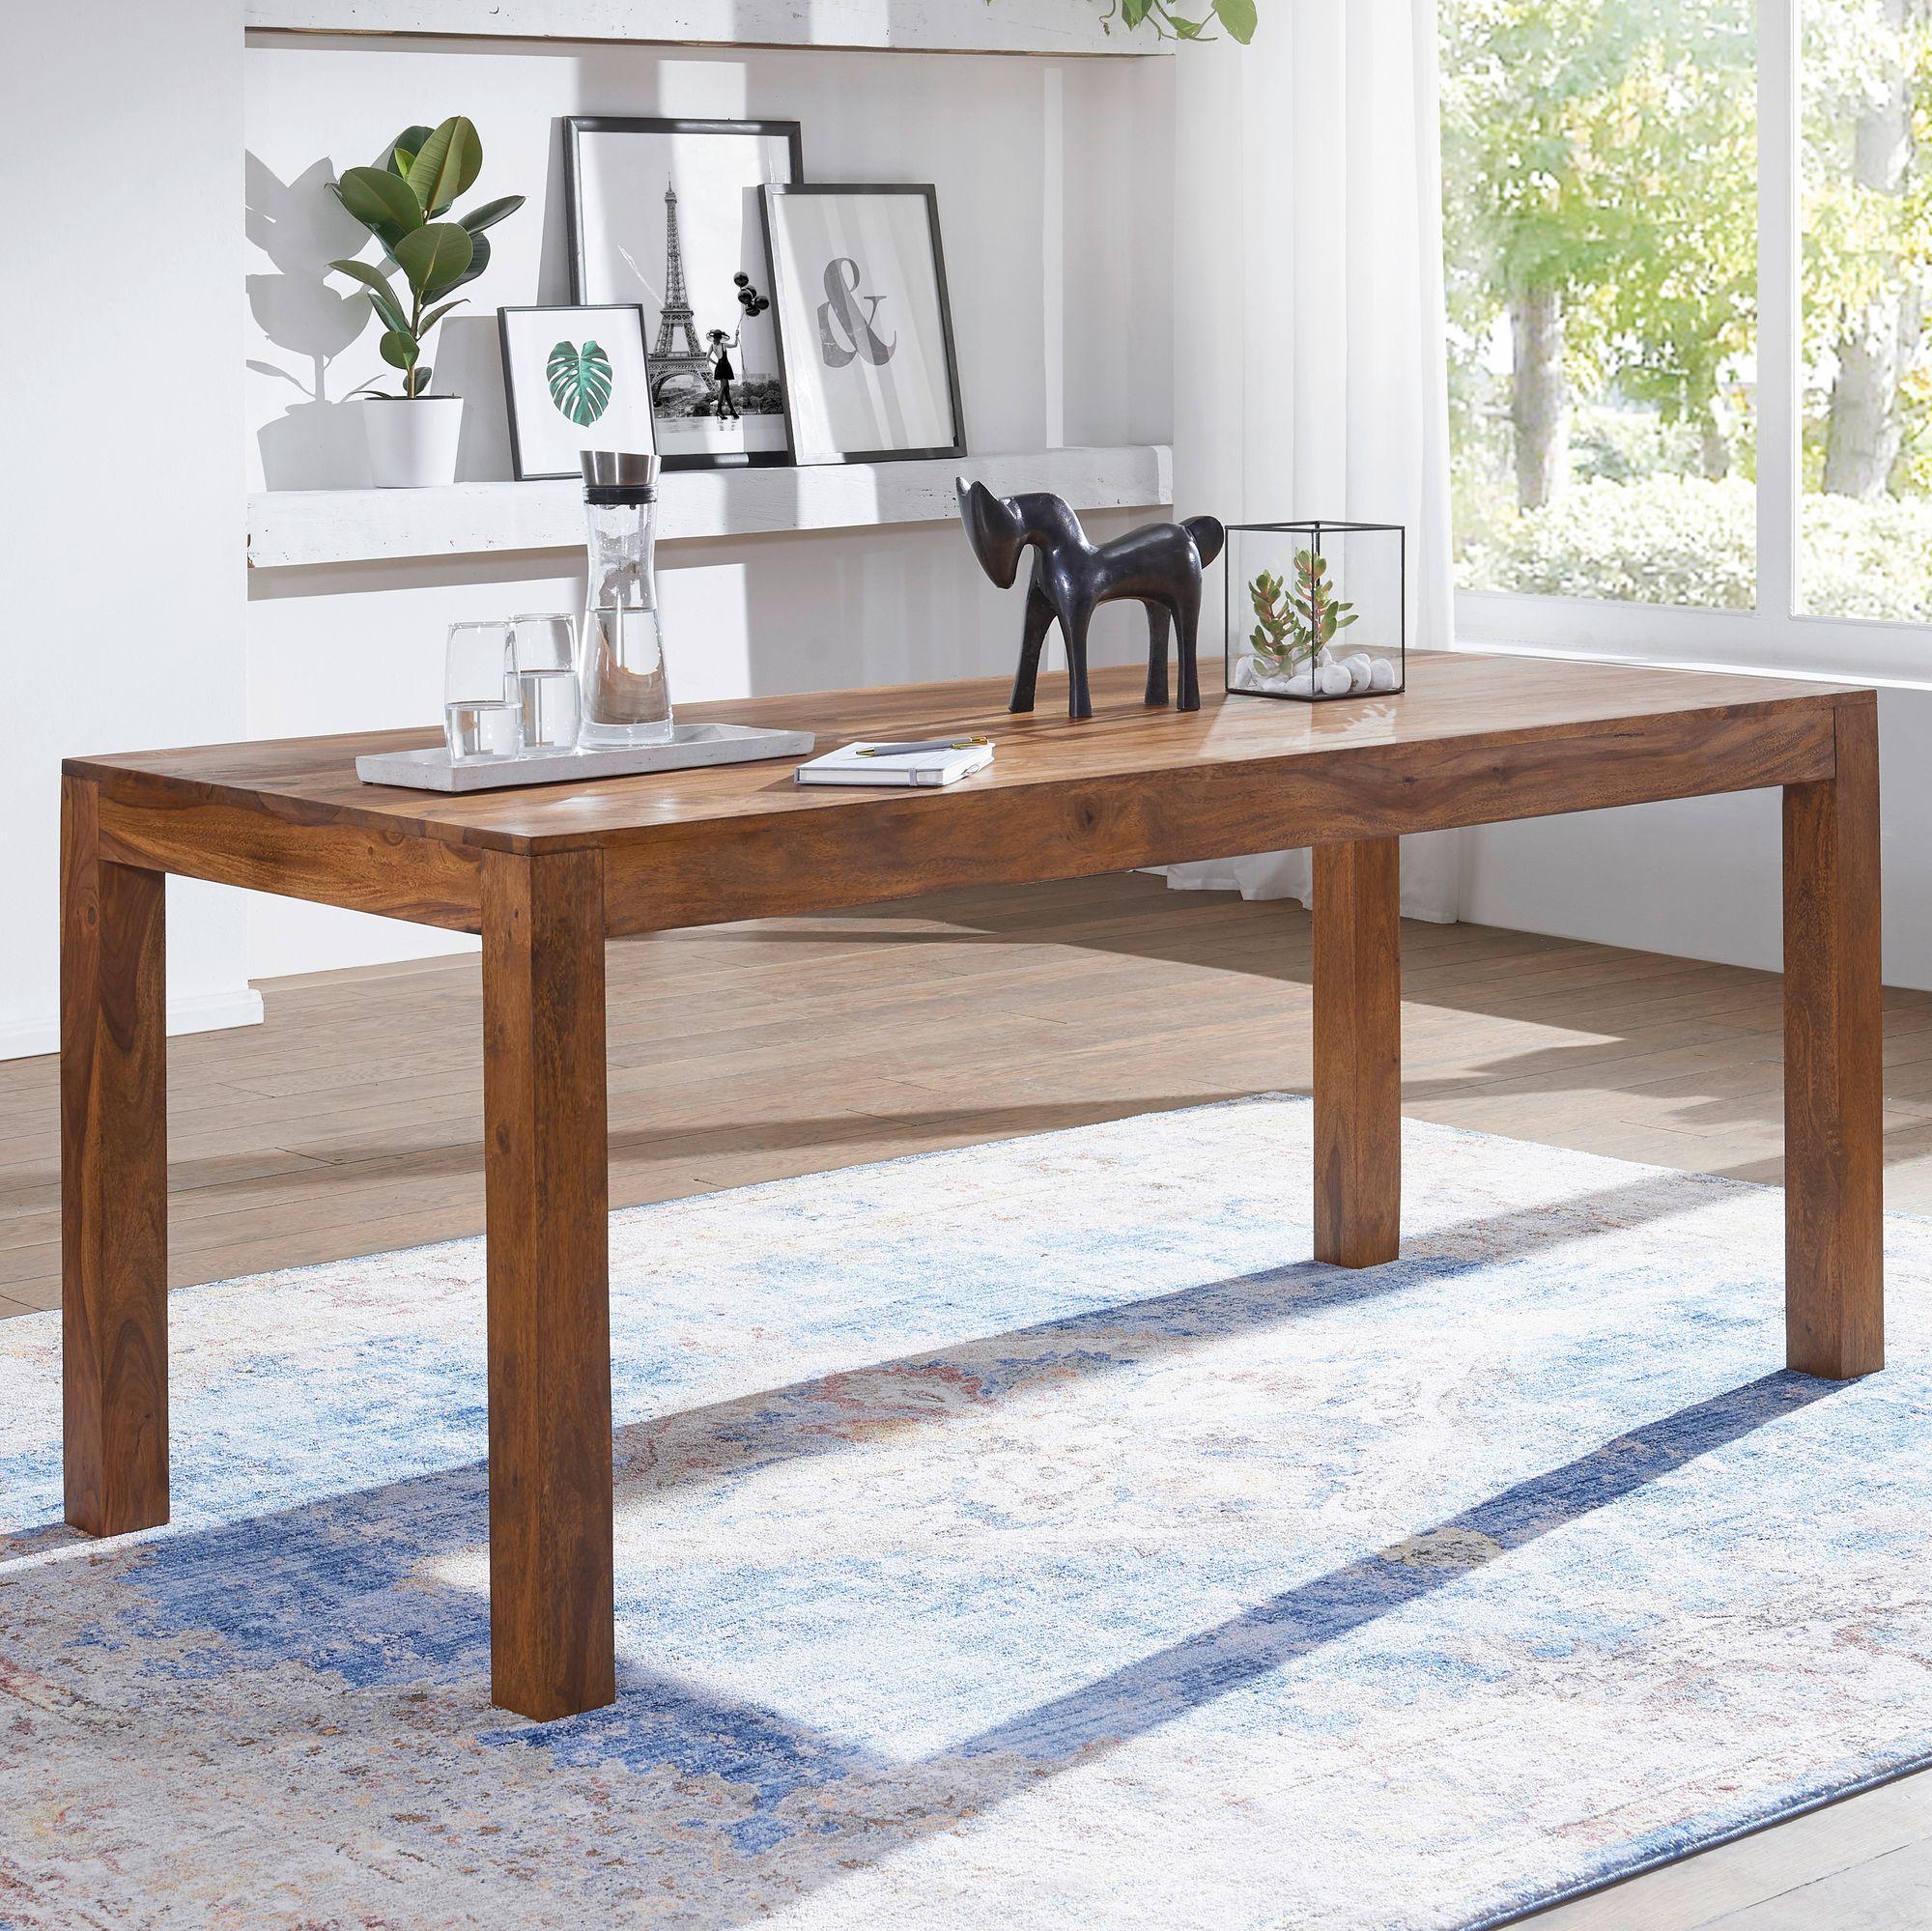 WOHNLING Design Esstisch MUMBAI Holz Massiv 160 x 80 x 76 cm ...